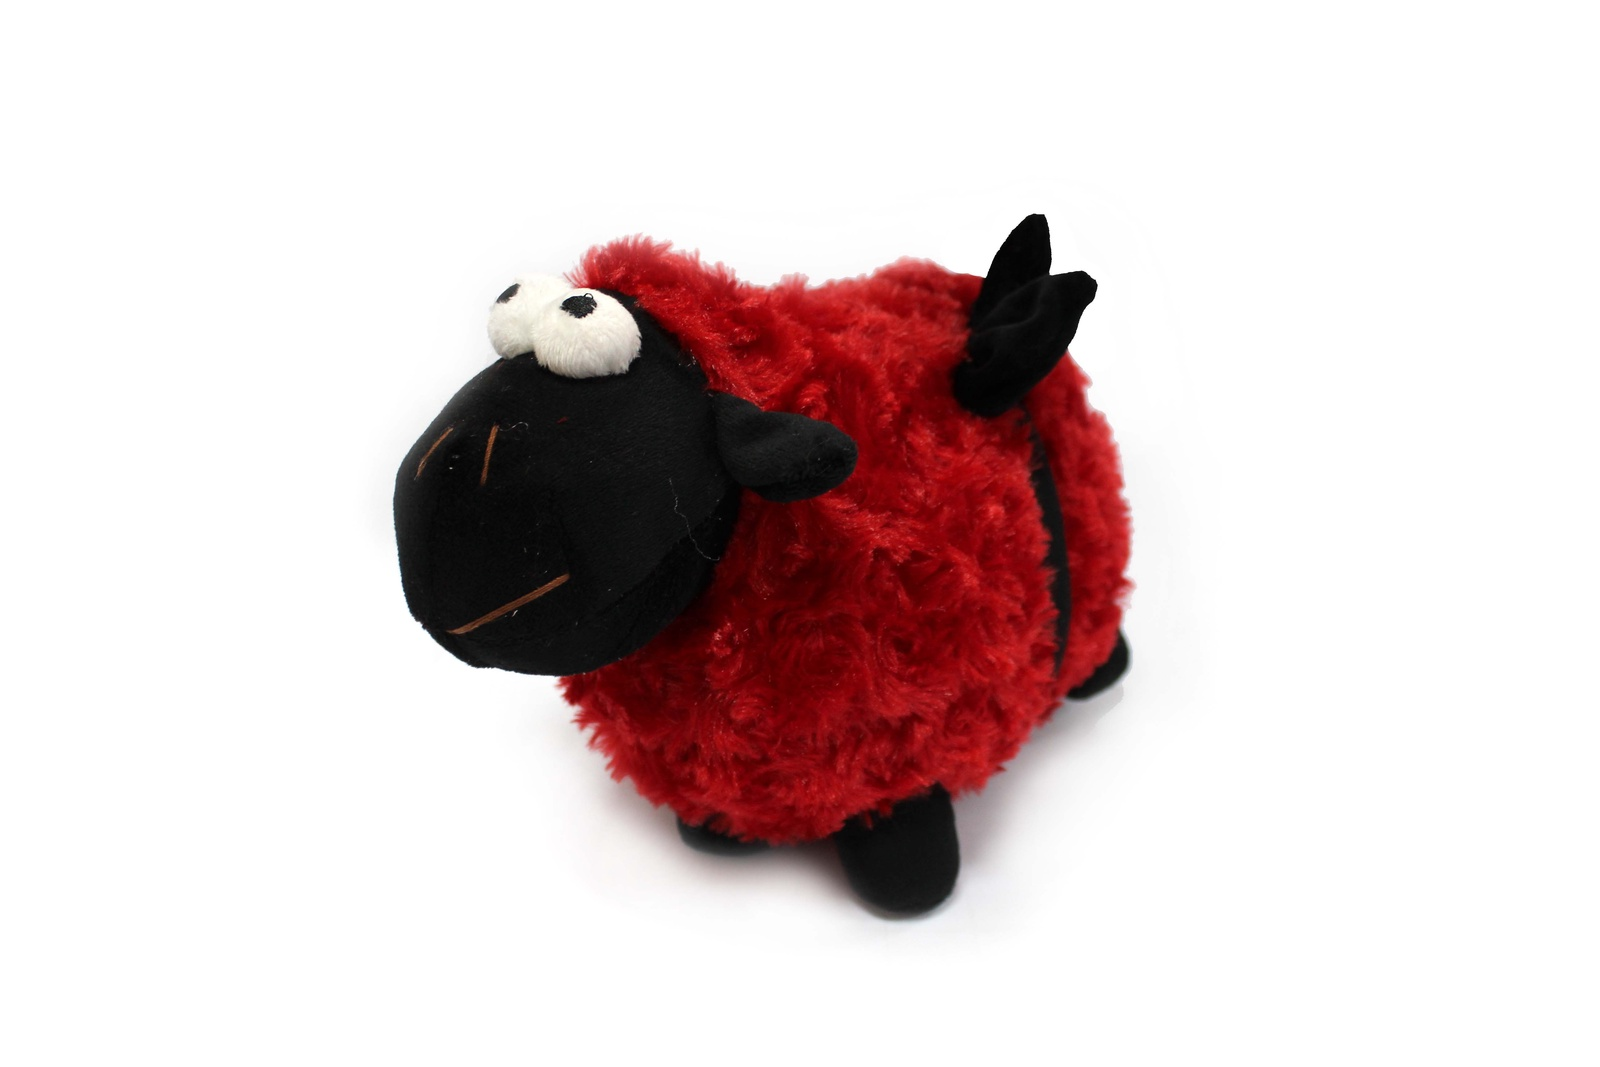 Мягкая игрушка Овечка NY732-2 мягкая игрушка sima land овечка на присосках 18 см 332770